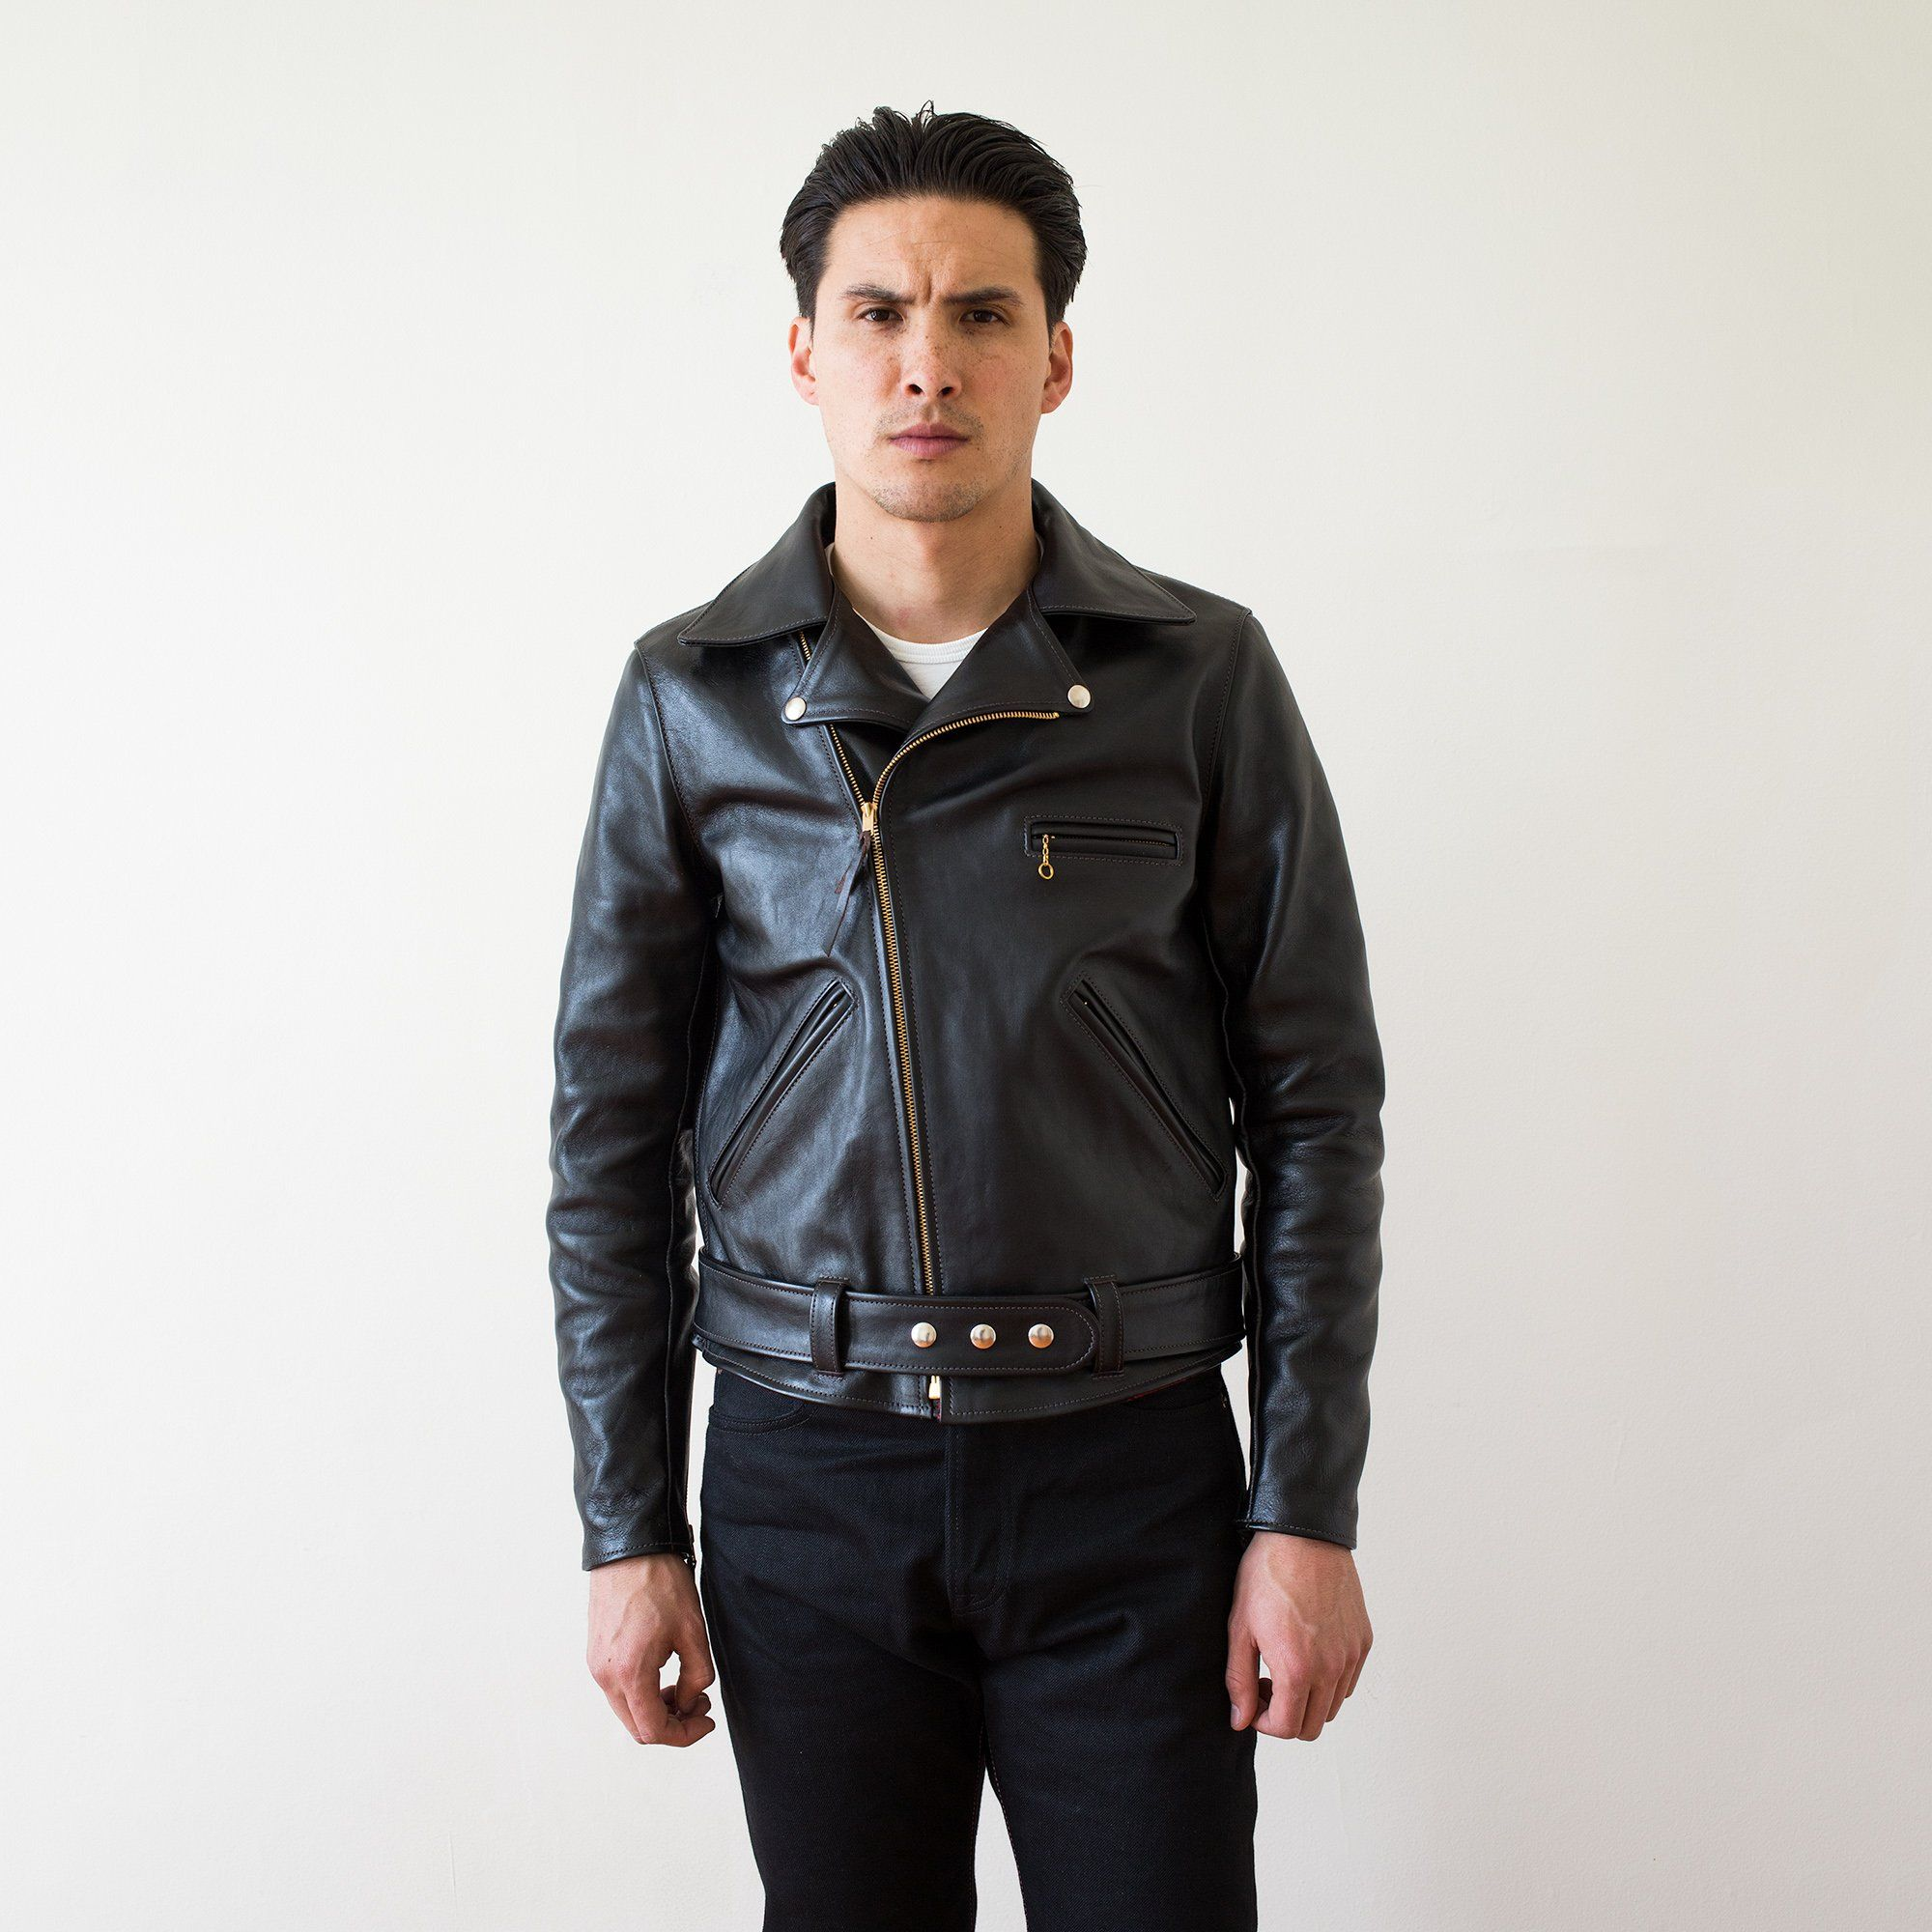 Real Mccoy S Buco Jh 1 Horsehide Leather Jacket Leather Jacket Black Jackets [ 2000 x 2000 Pixel ]